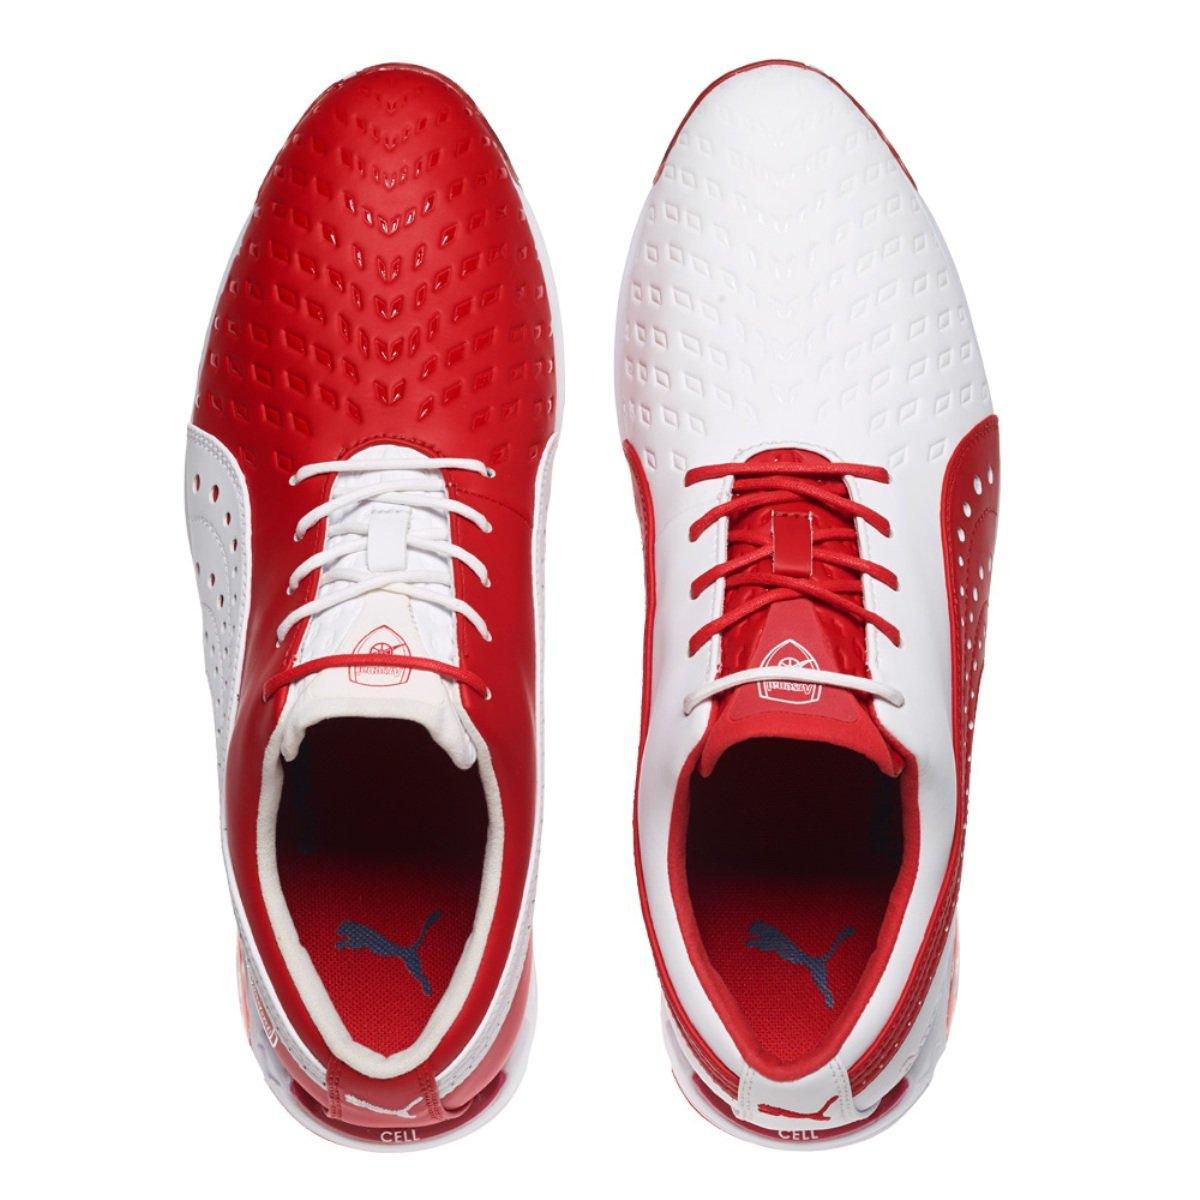 Puma Golf Neo Lux Edition Limitée Arsenal Chaussures de golf